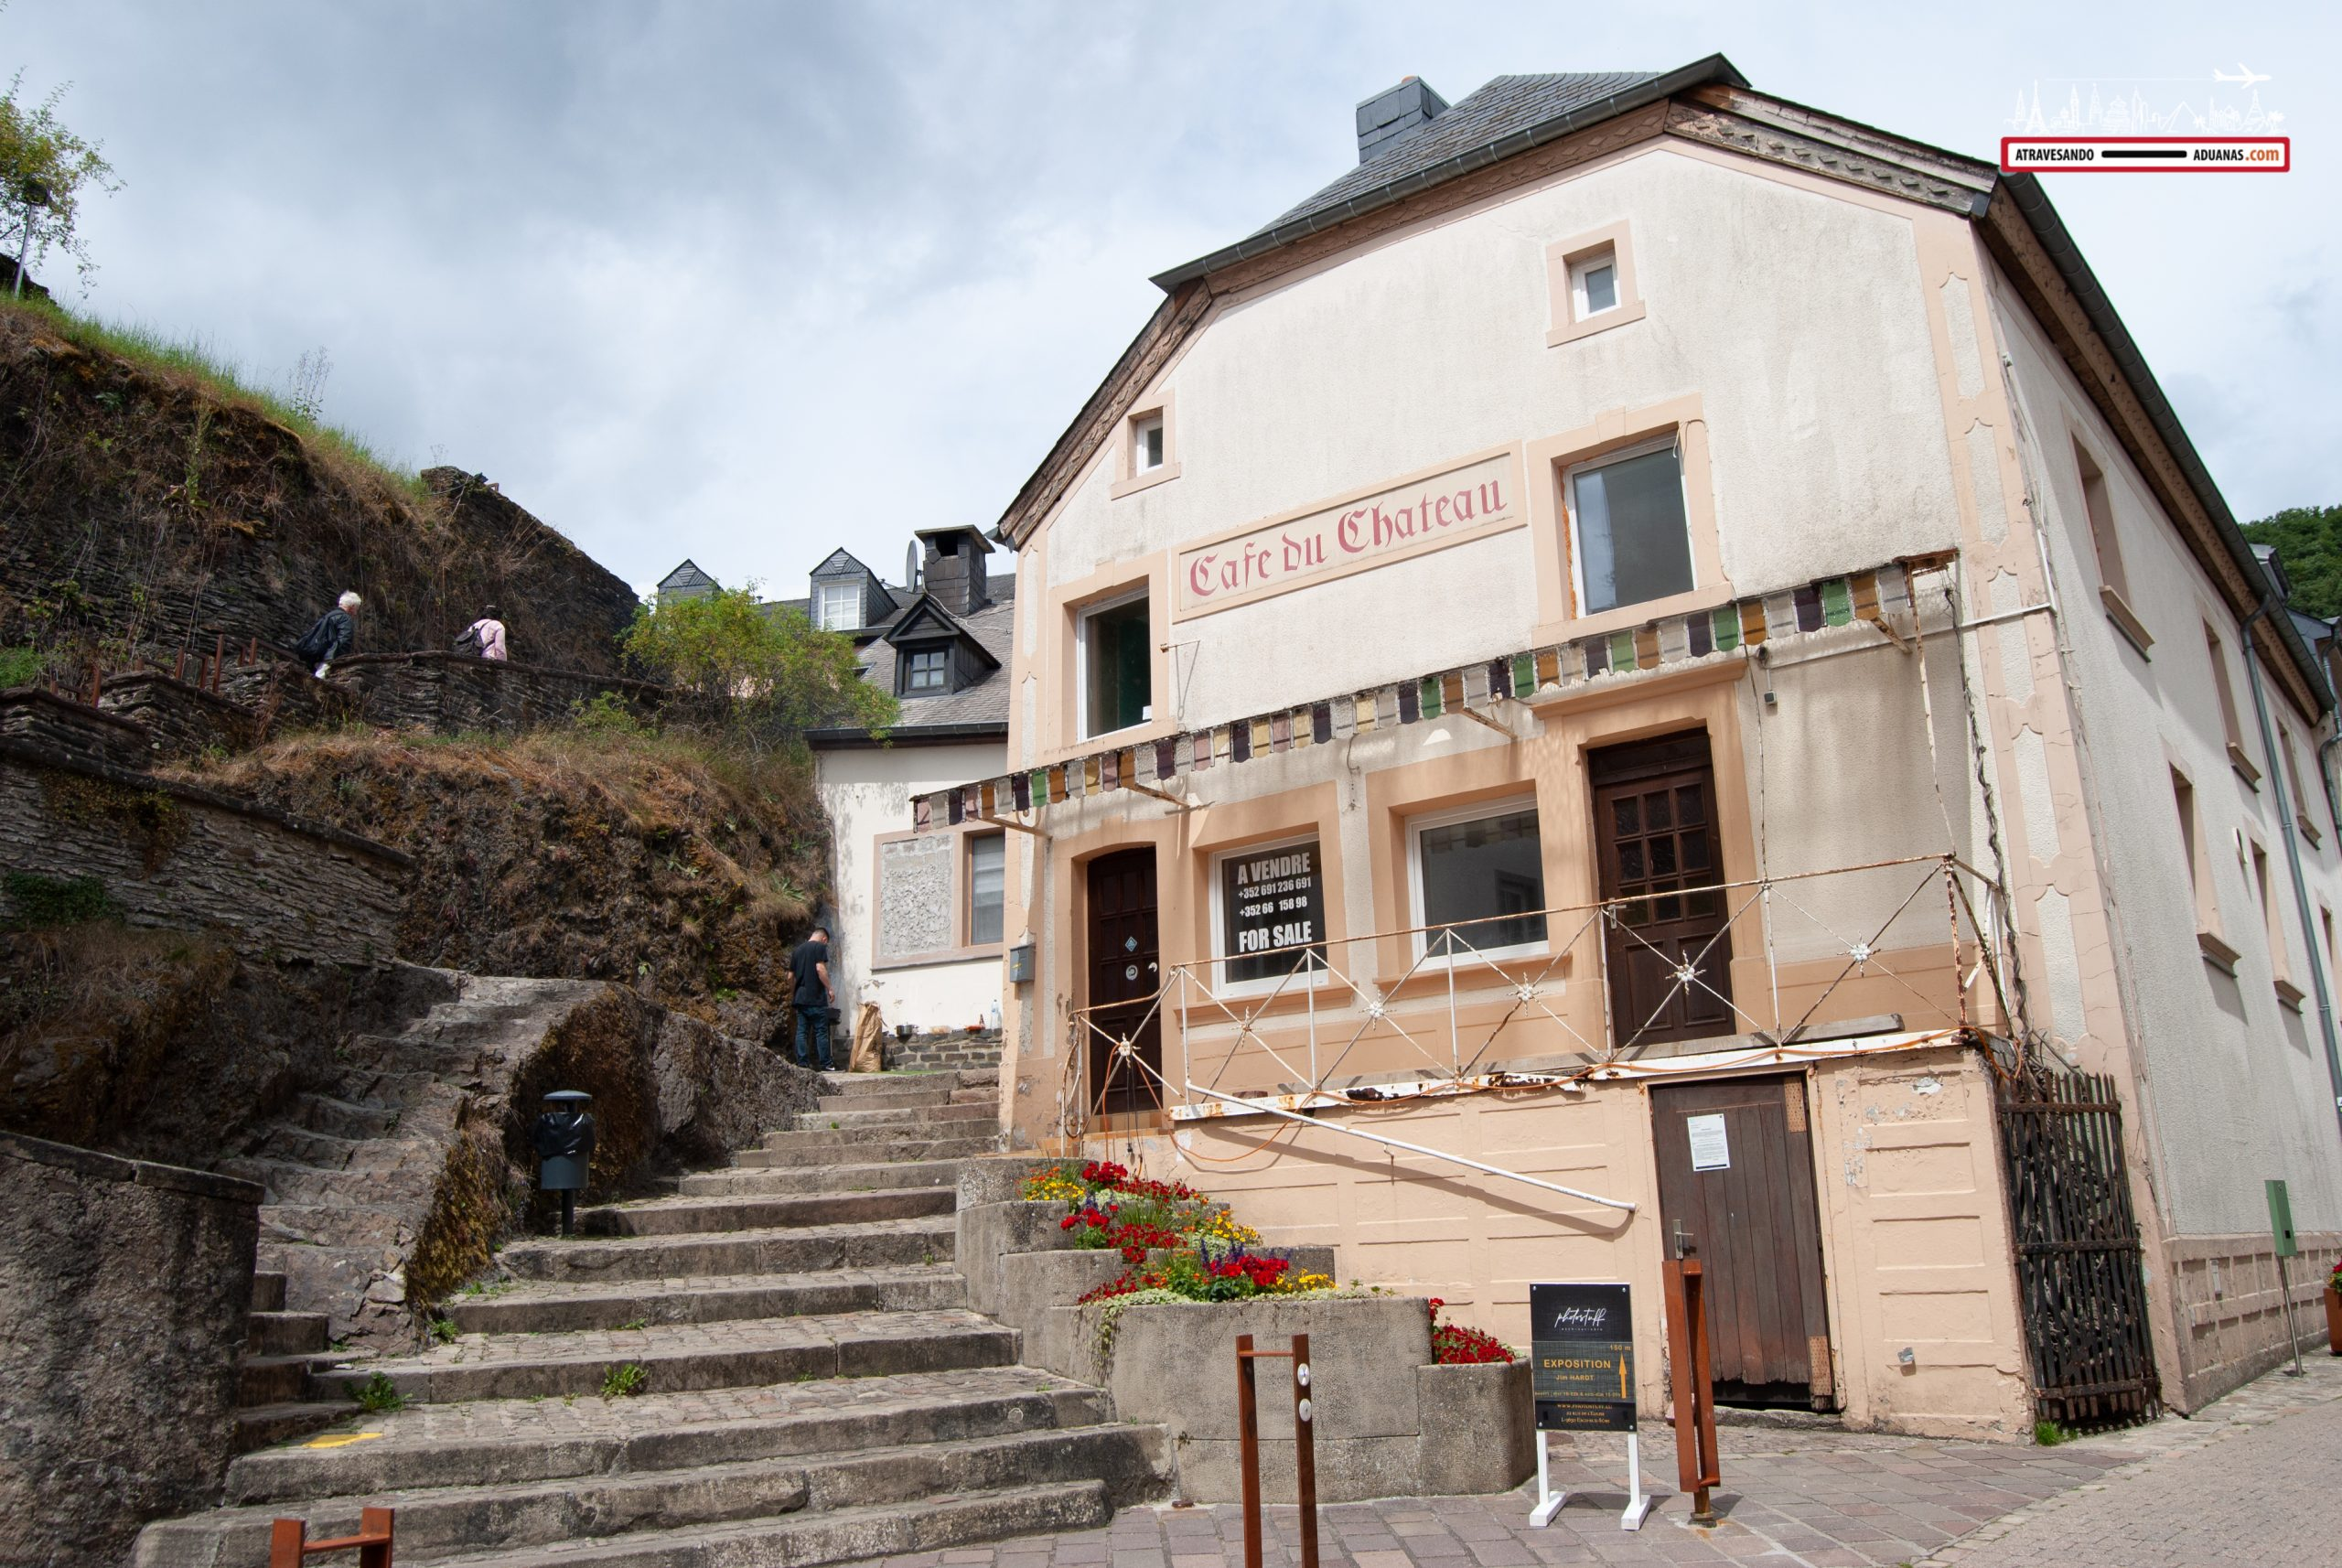 Casitas en esch-sur-sûre, luxemburgo